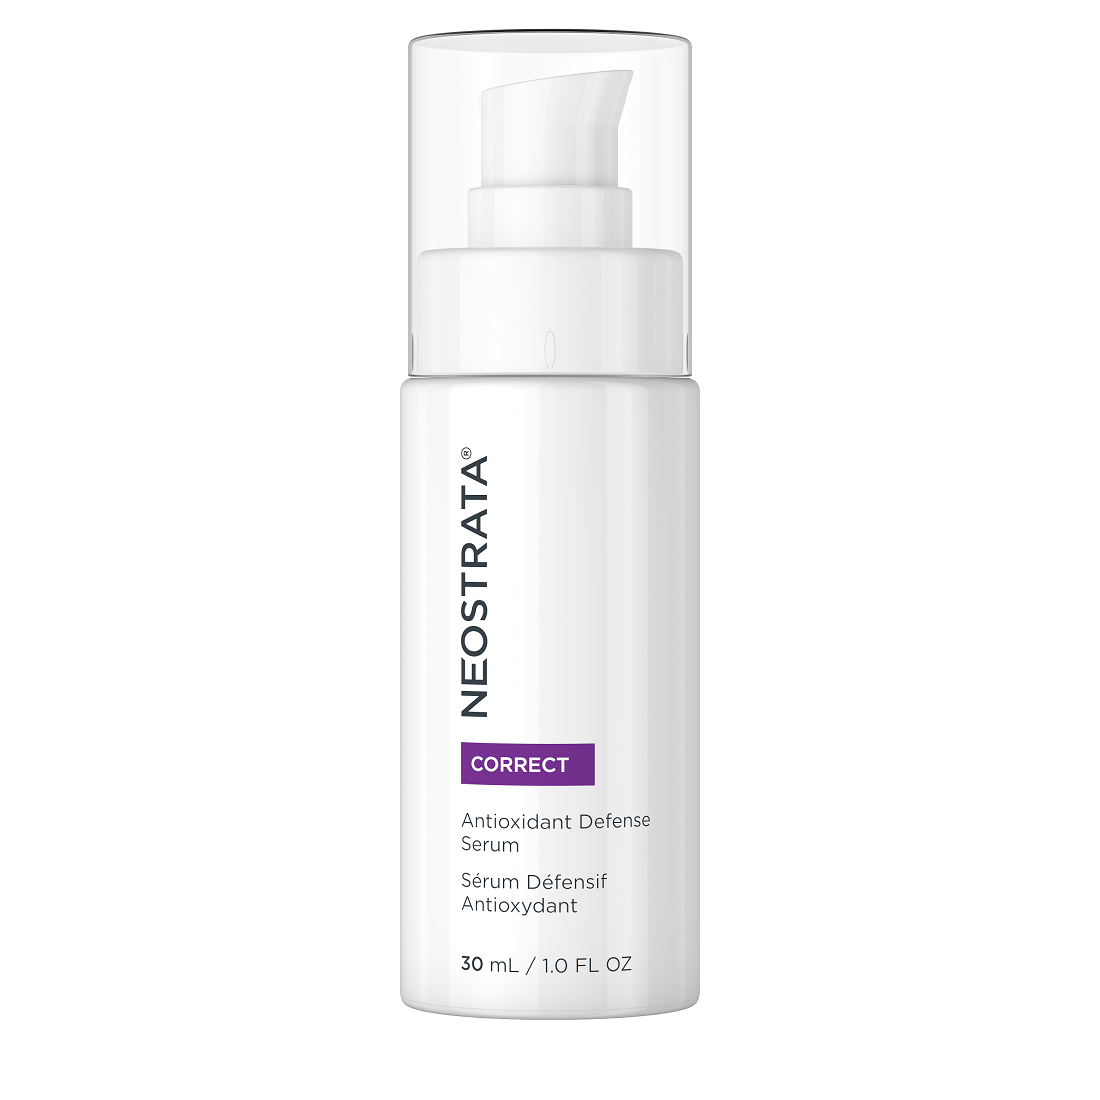 F30165_Antioxidant_Defense_Serum_1oz_0000